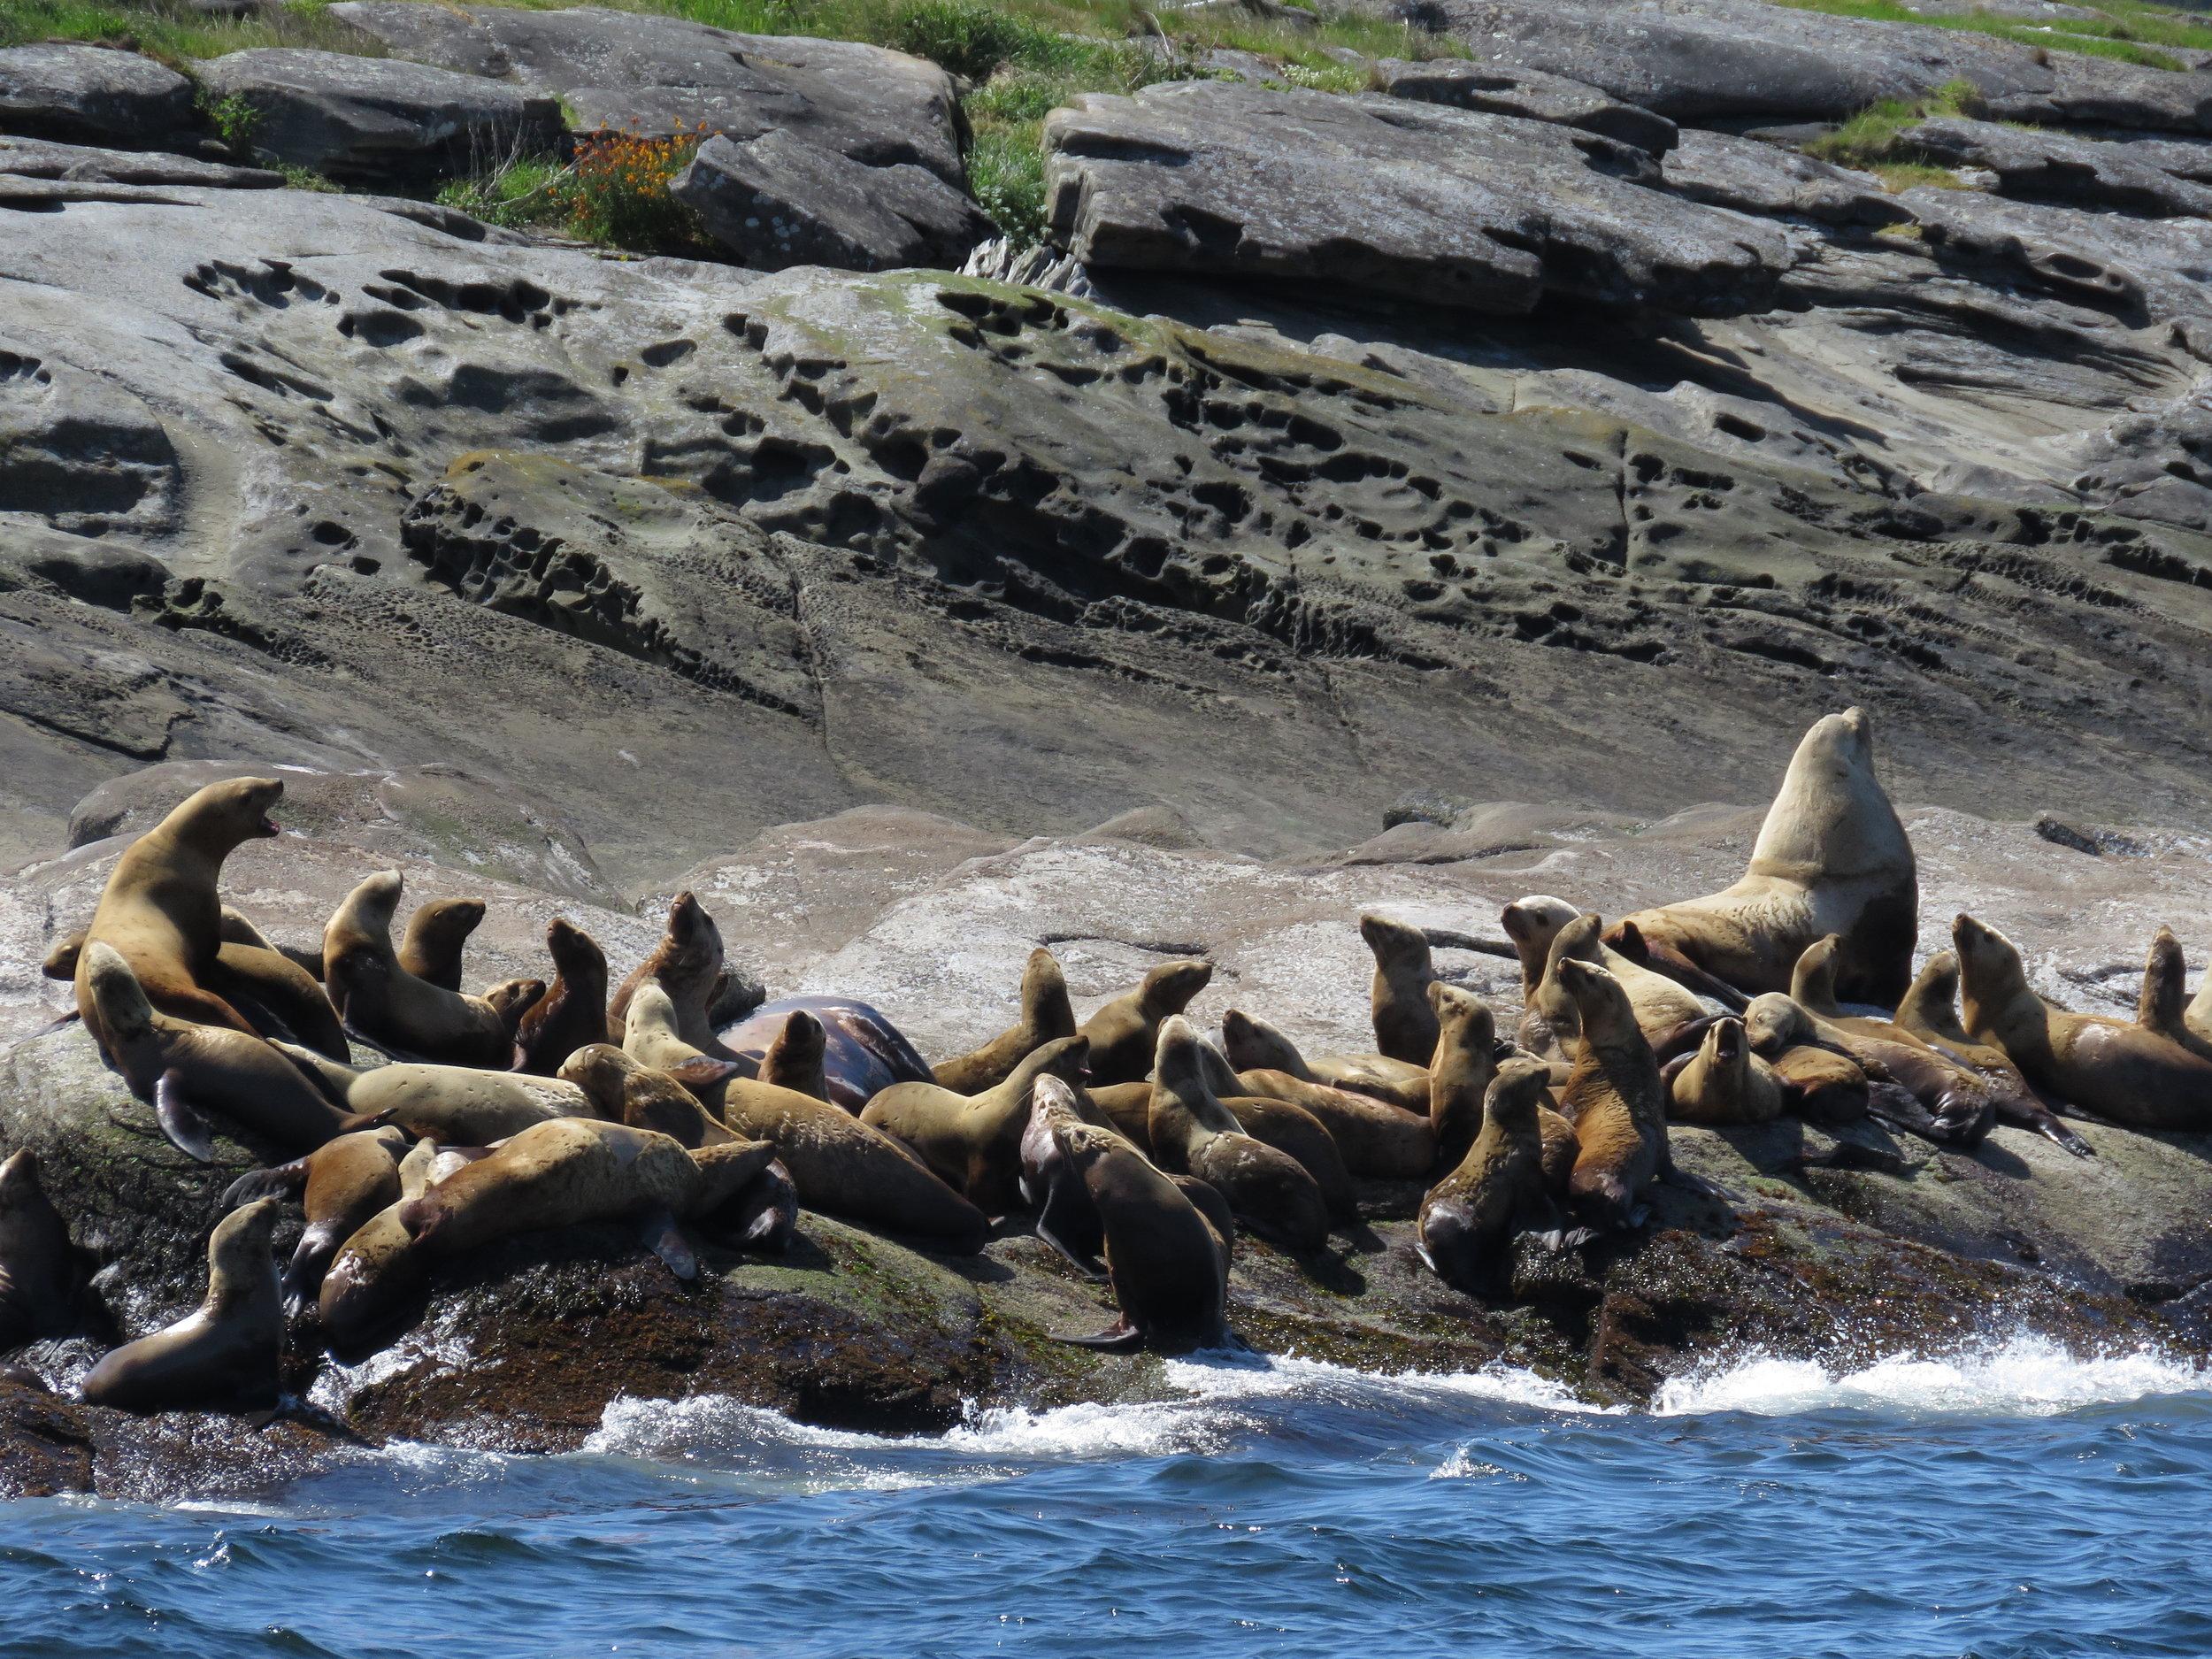 Steller sea lions enjoying the sun. Photo by Rodrigo Menezes